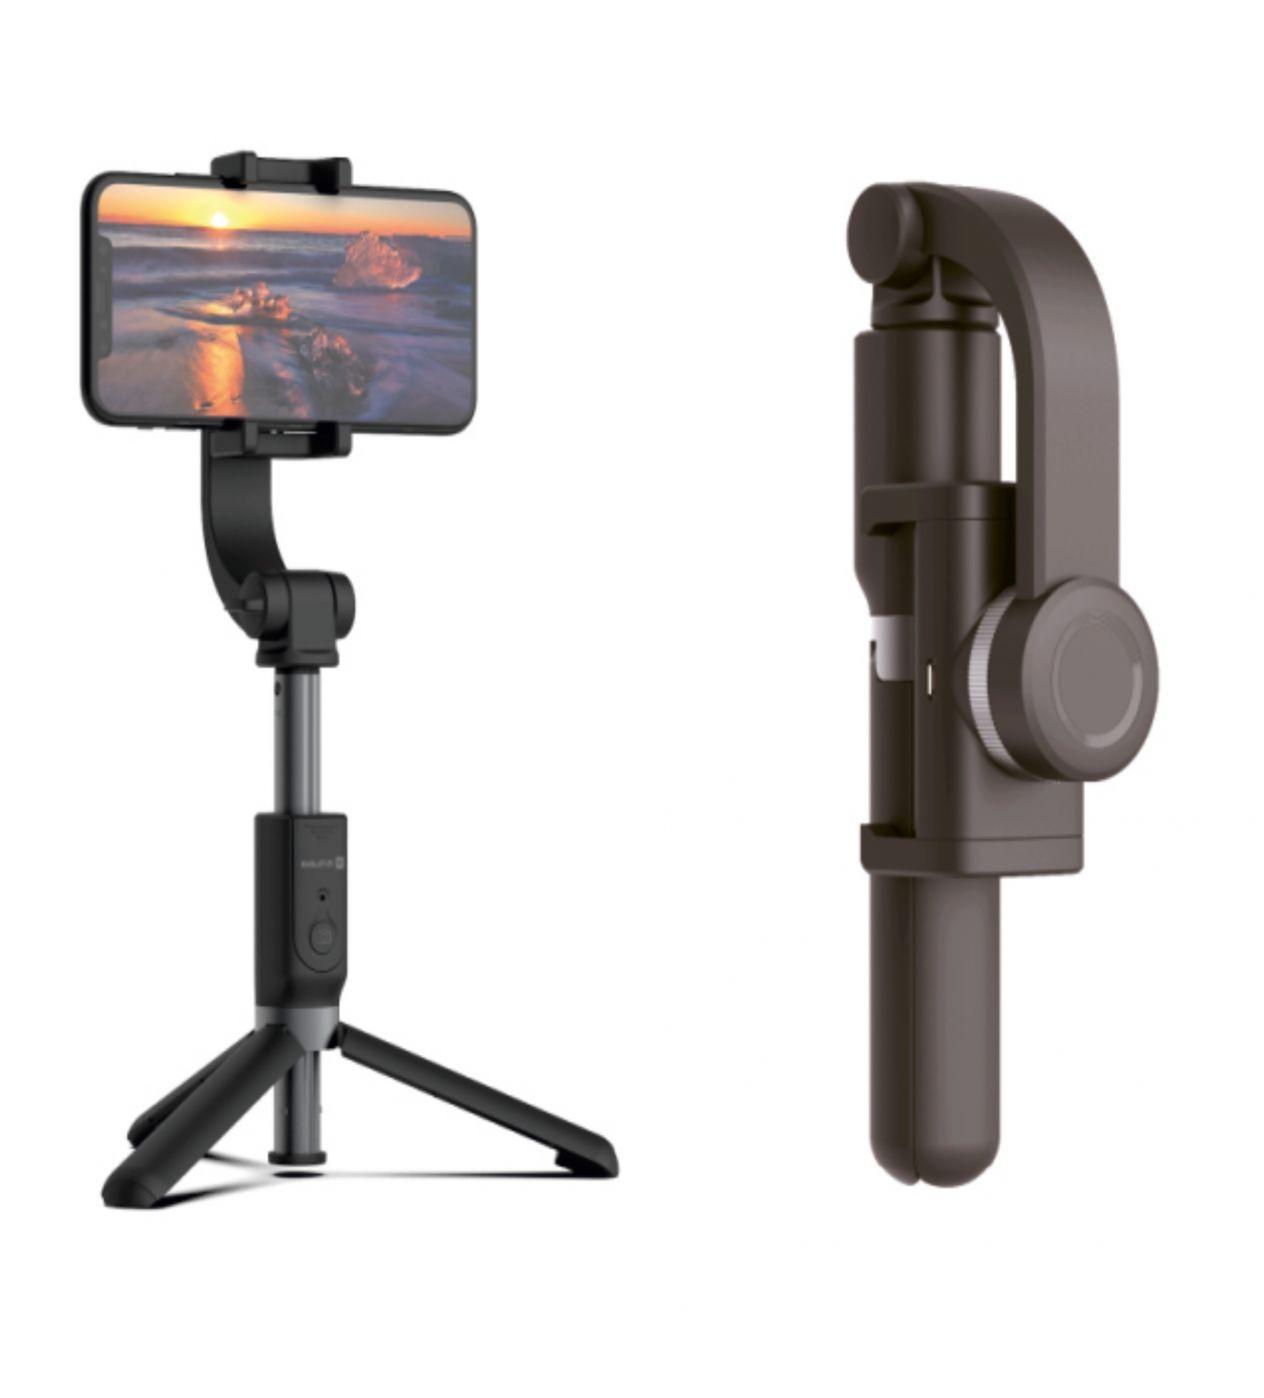 Evelatus Tripod Selfie Stick with Smart Stabilizer ETS01 Black  Black Selfie Stick